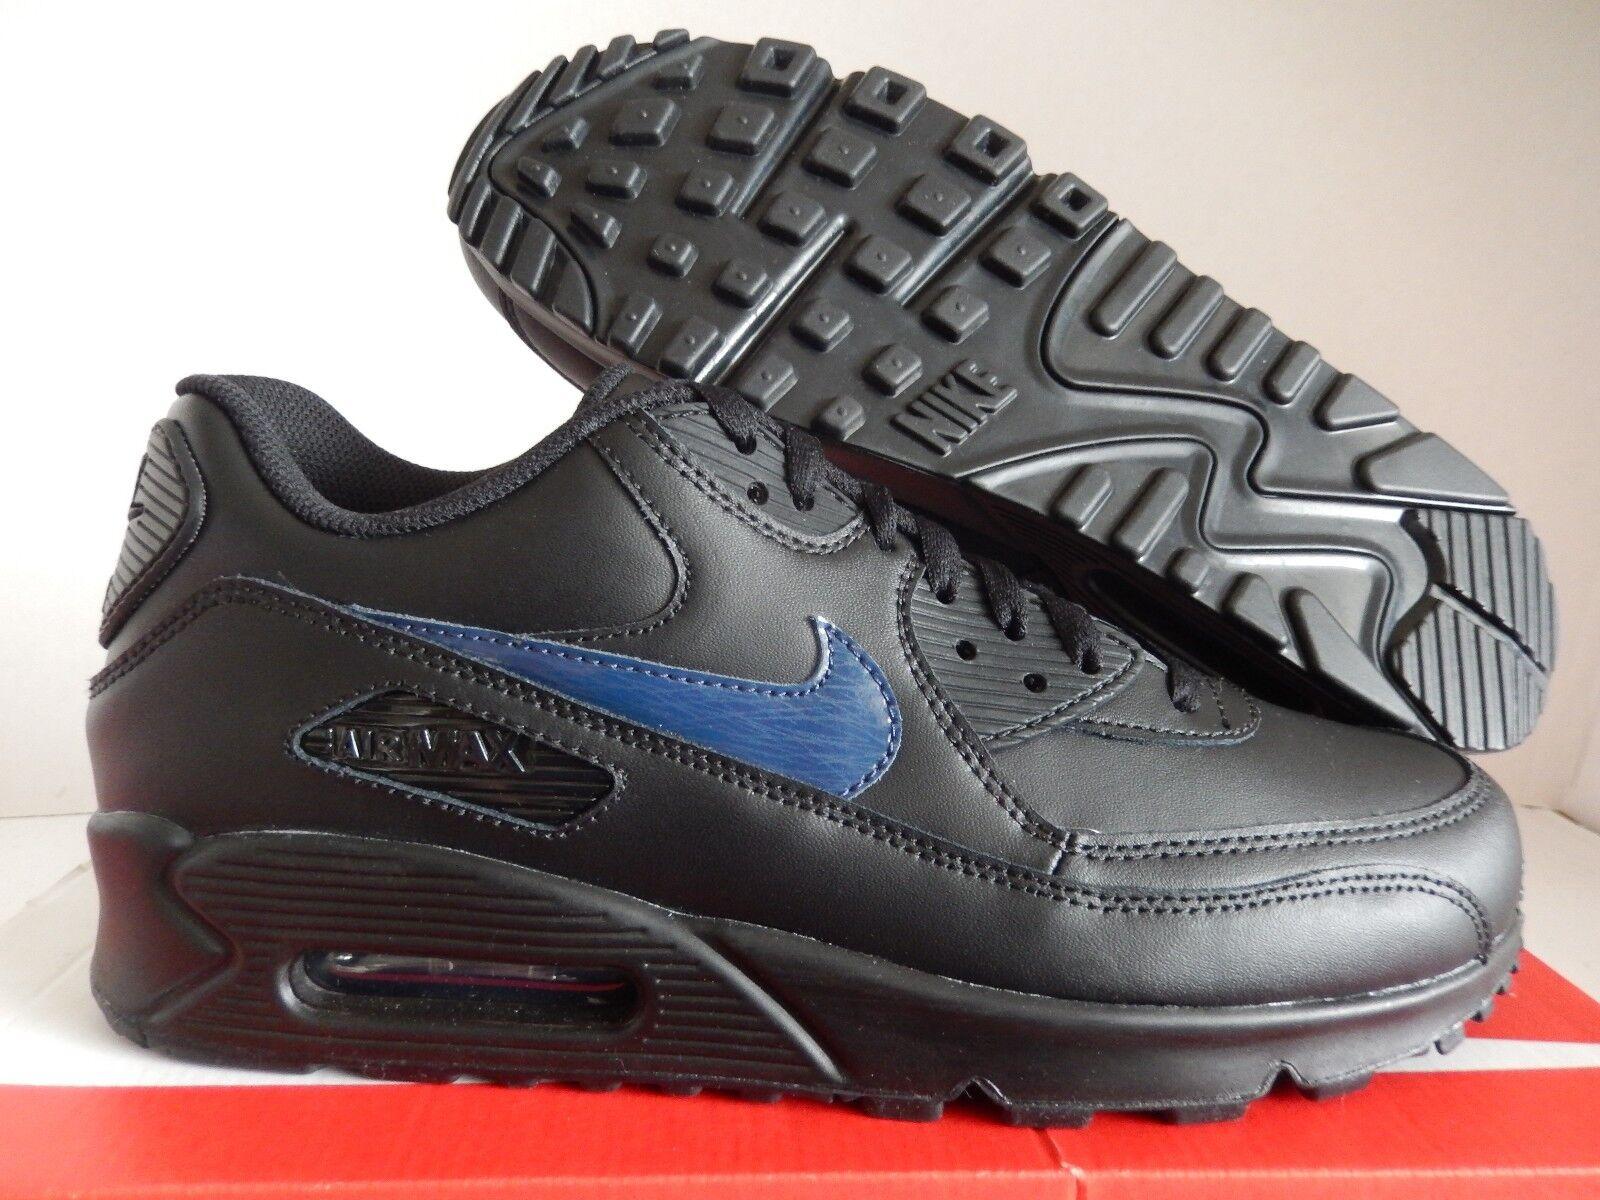 NIKE AIR MAX 90 ID BLACK-BLUE SZ 9.5 [931902-994]